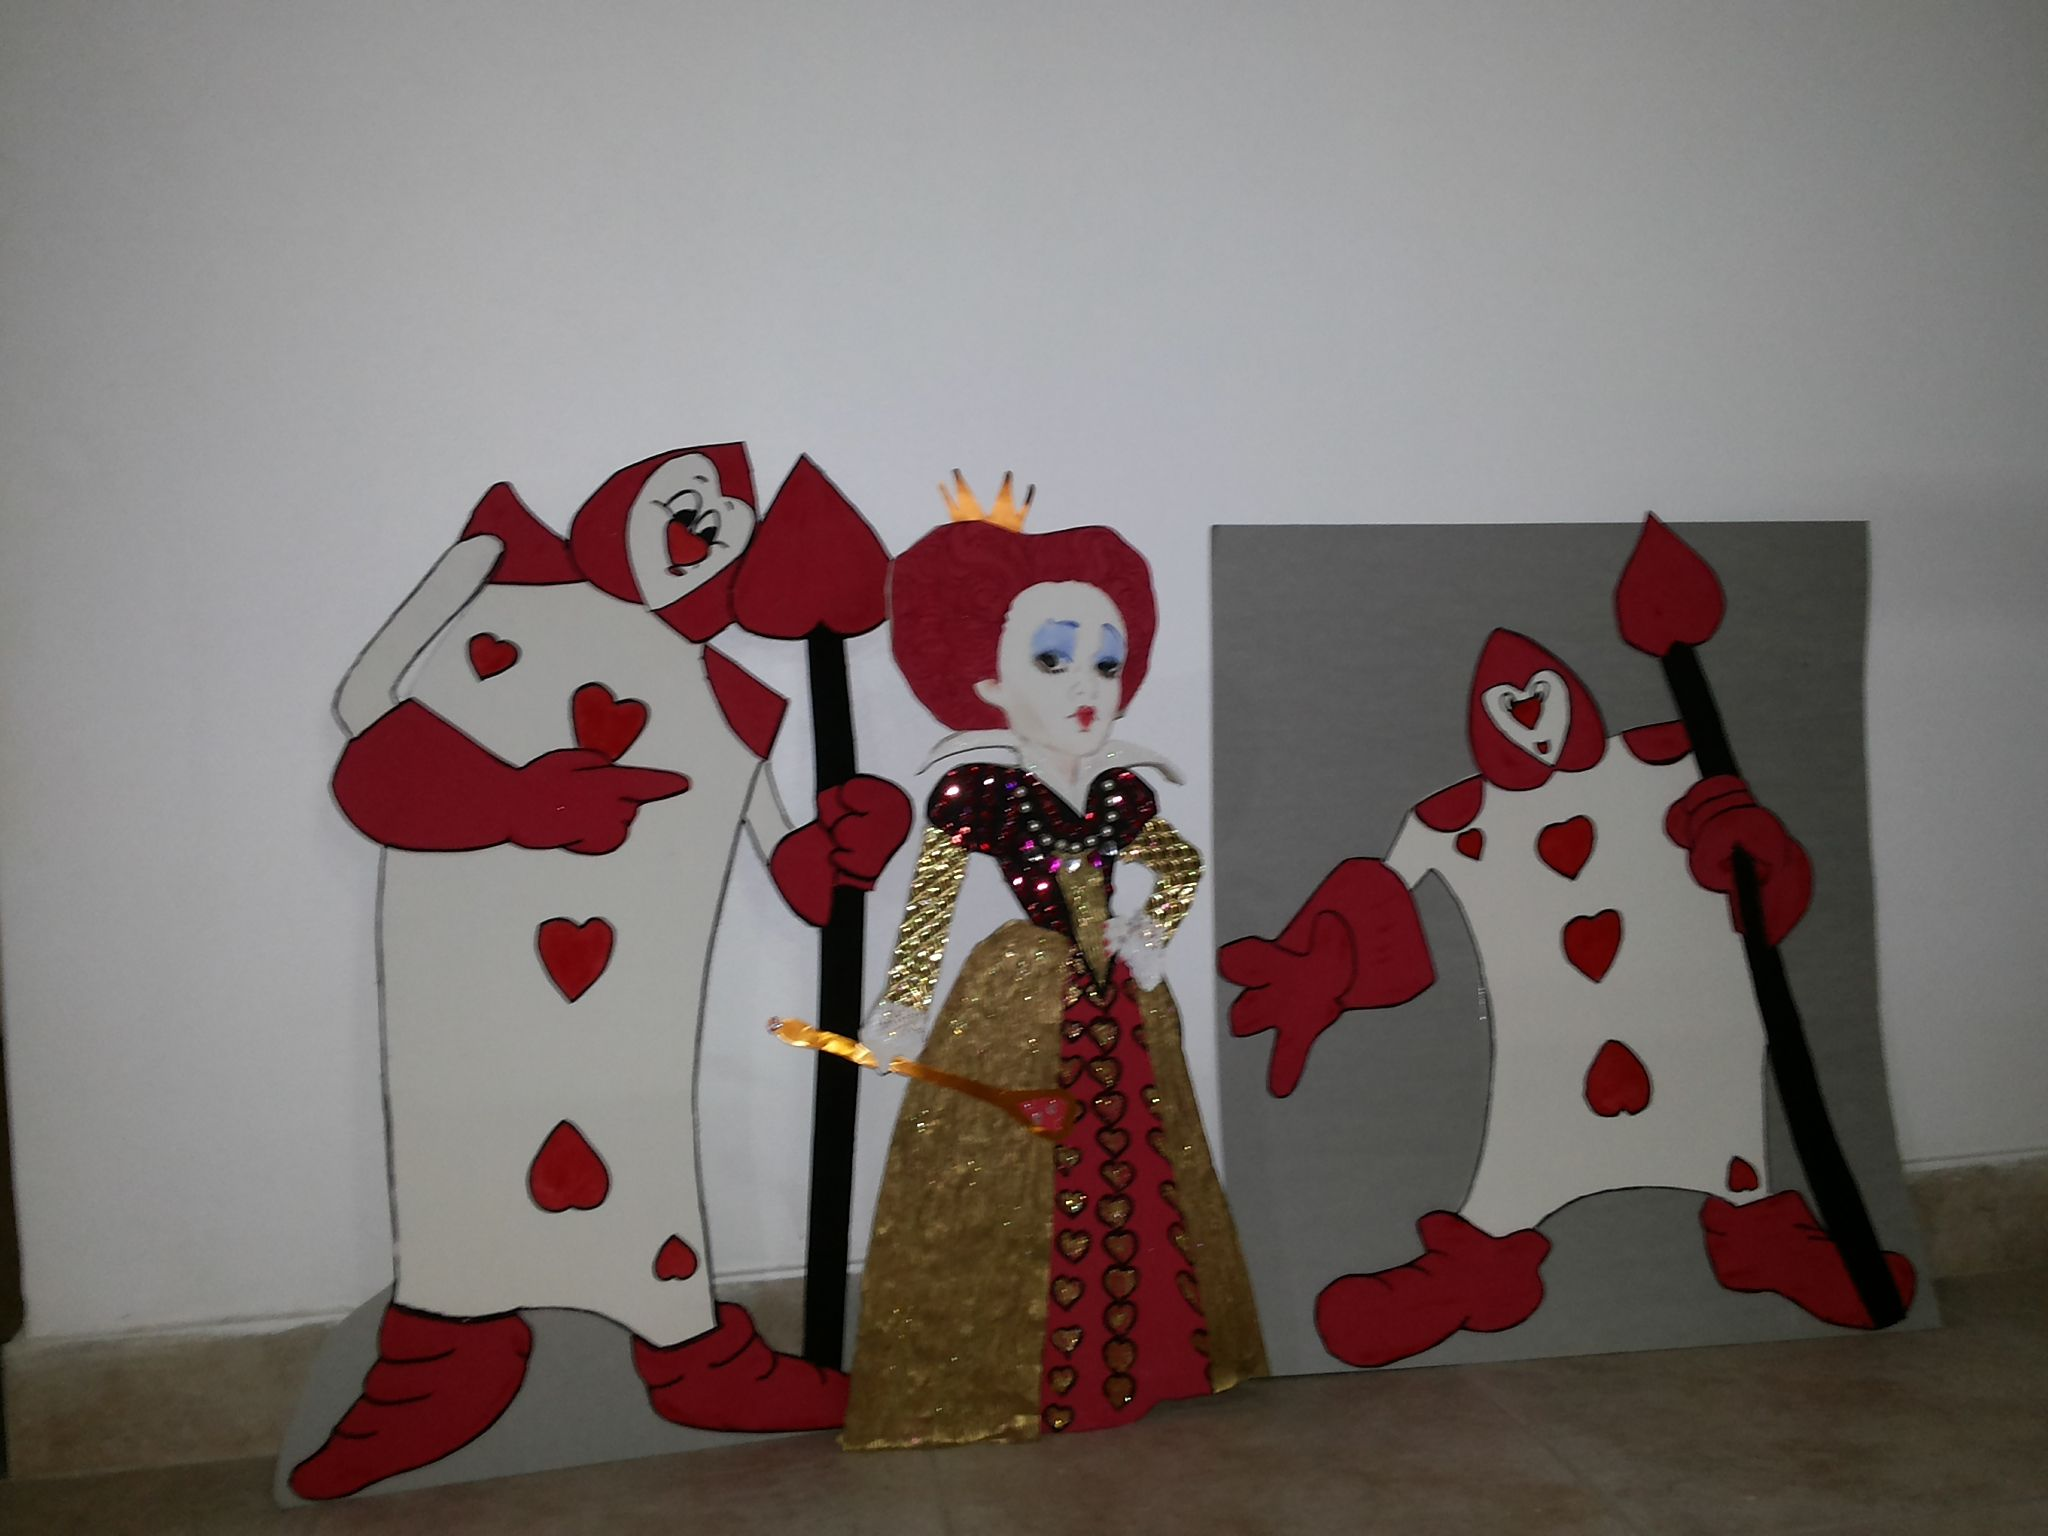 cartas y reina roja | mis trbajos en goma eva | Reina roja ...